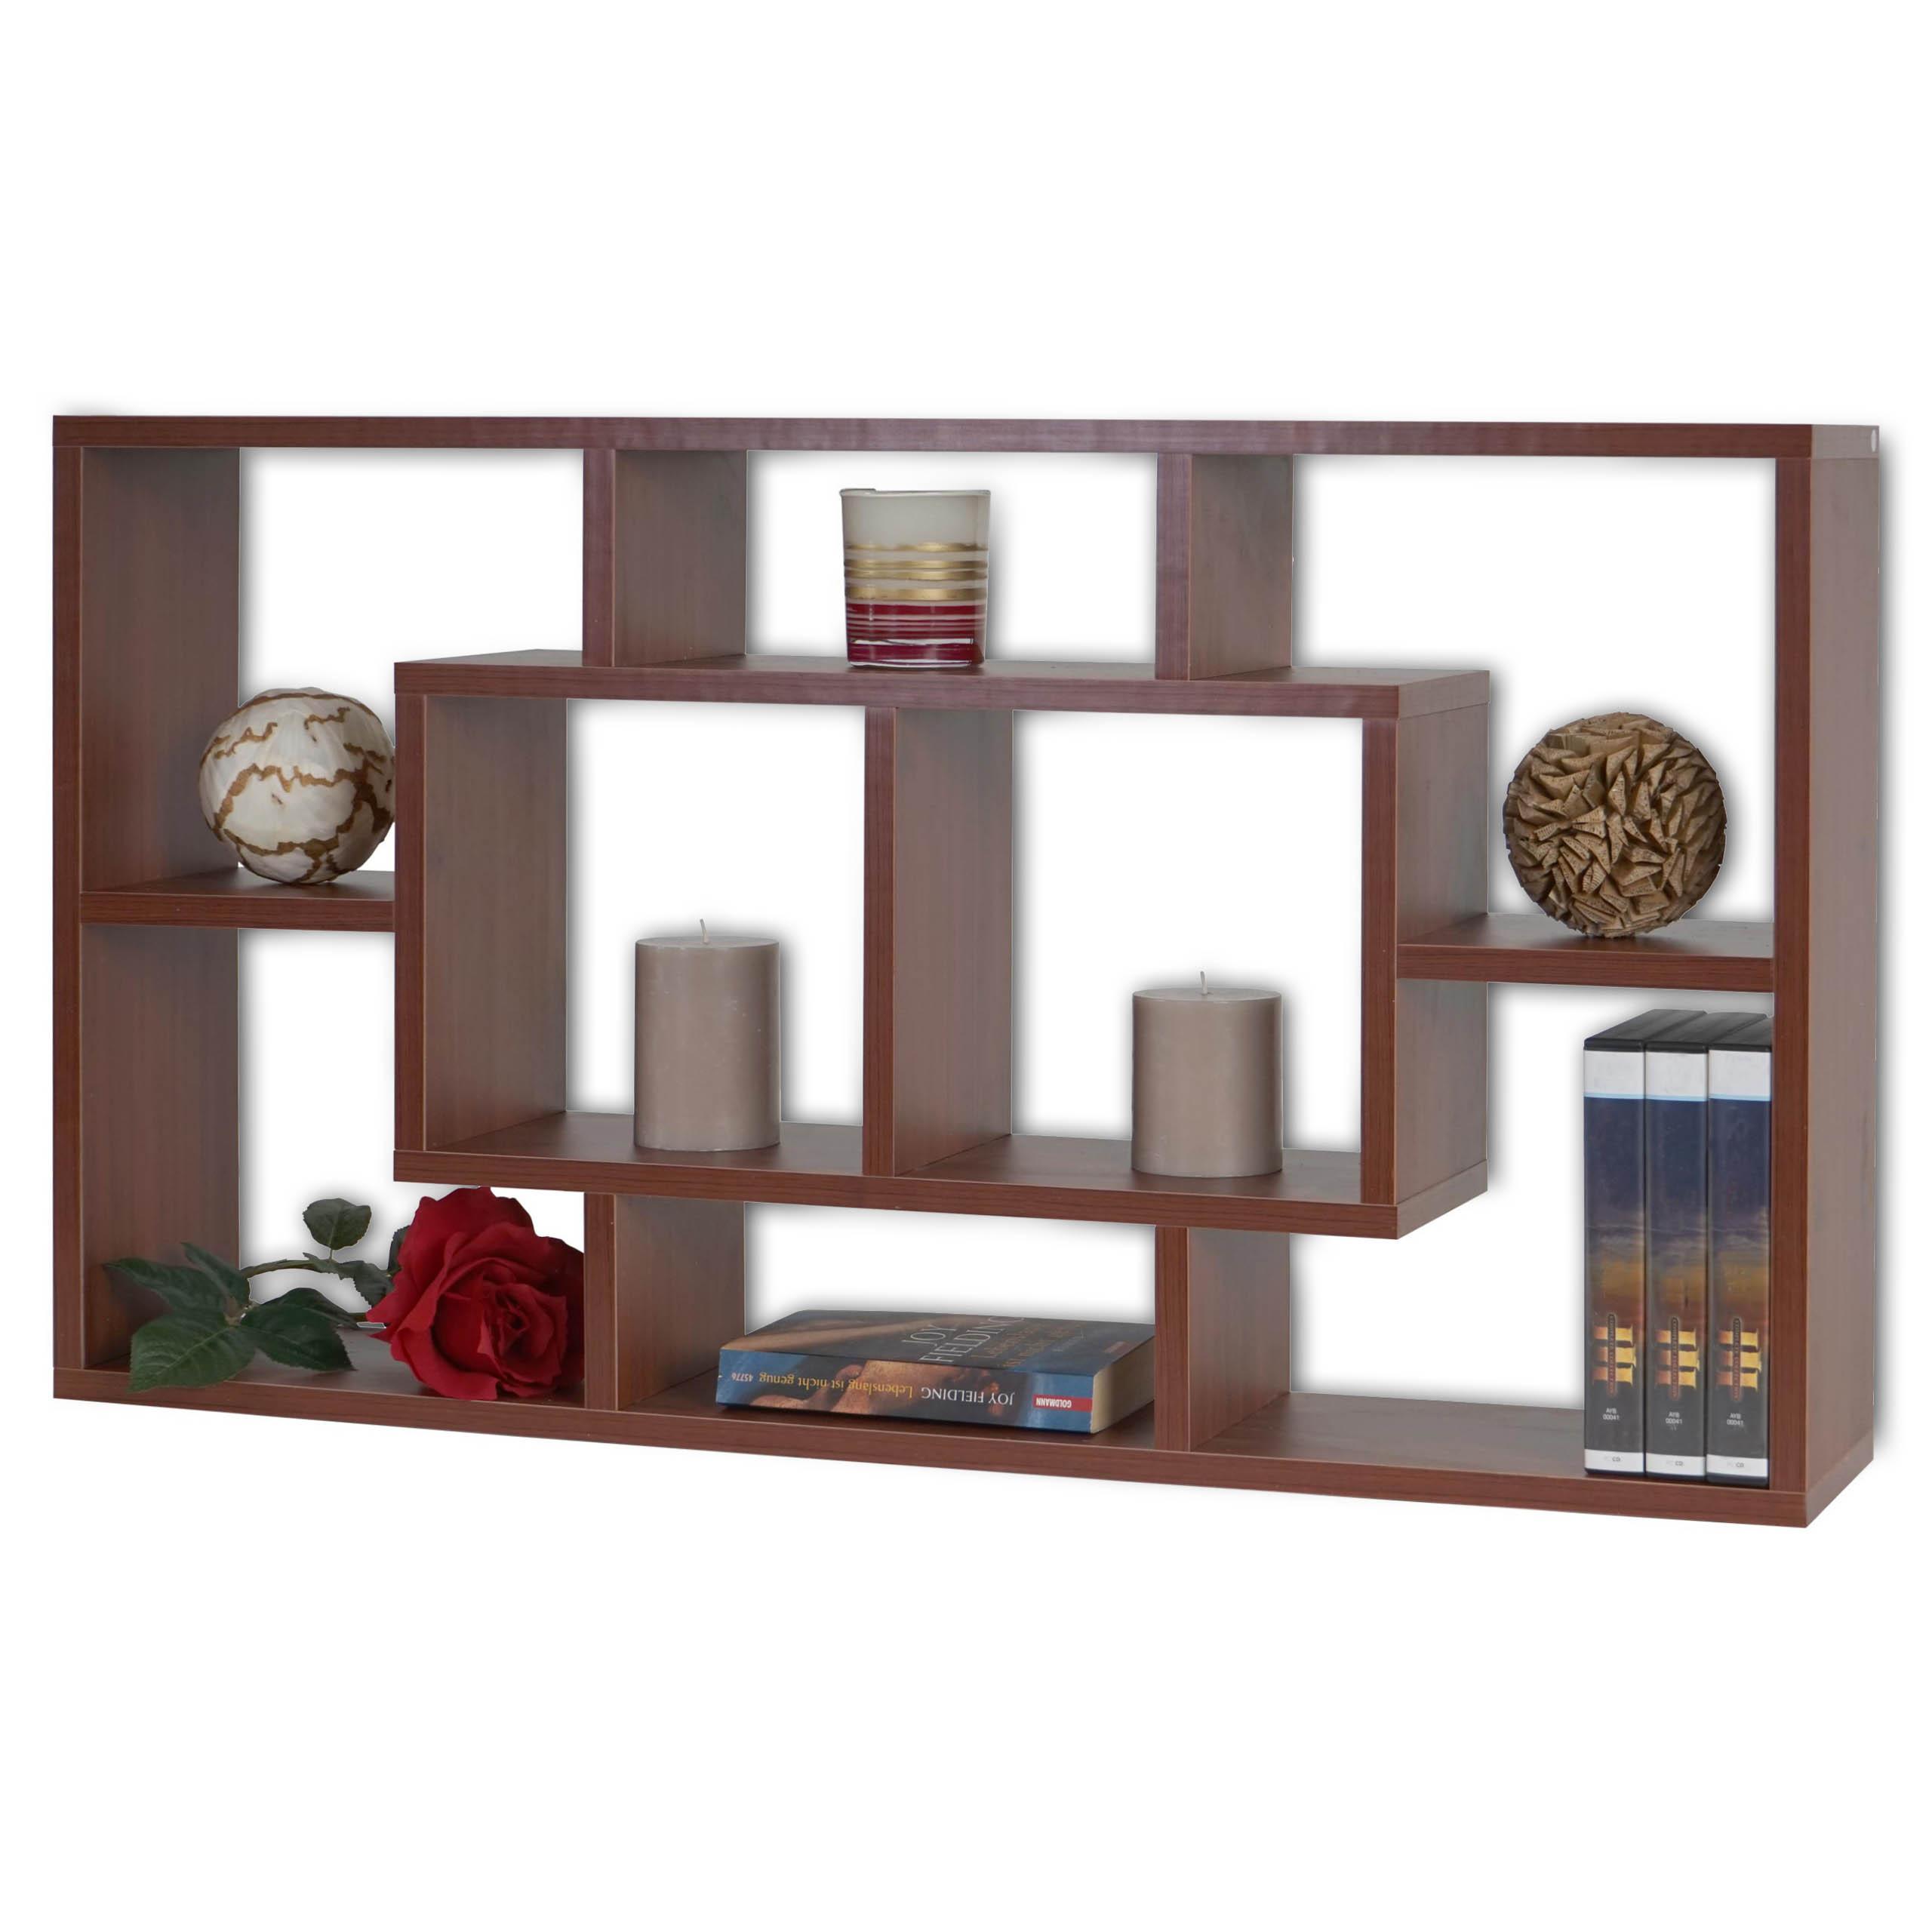 wandregal nyon t521 h ngeregal b cherregal 48x85x16cm. Black Bedroom Furniture Sets. Home Design Ideas